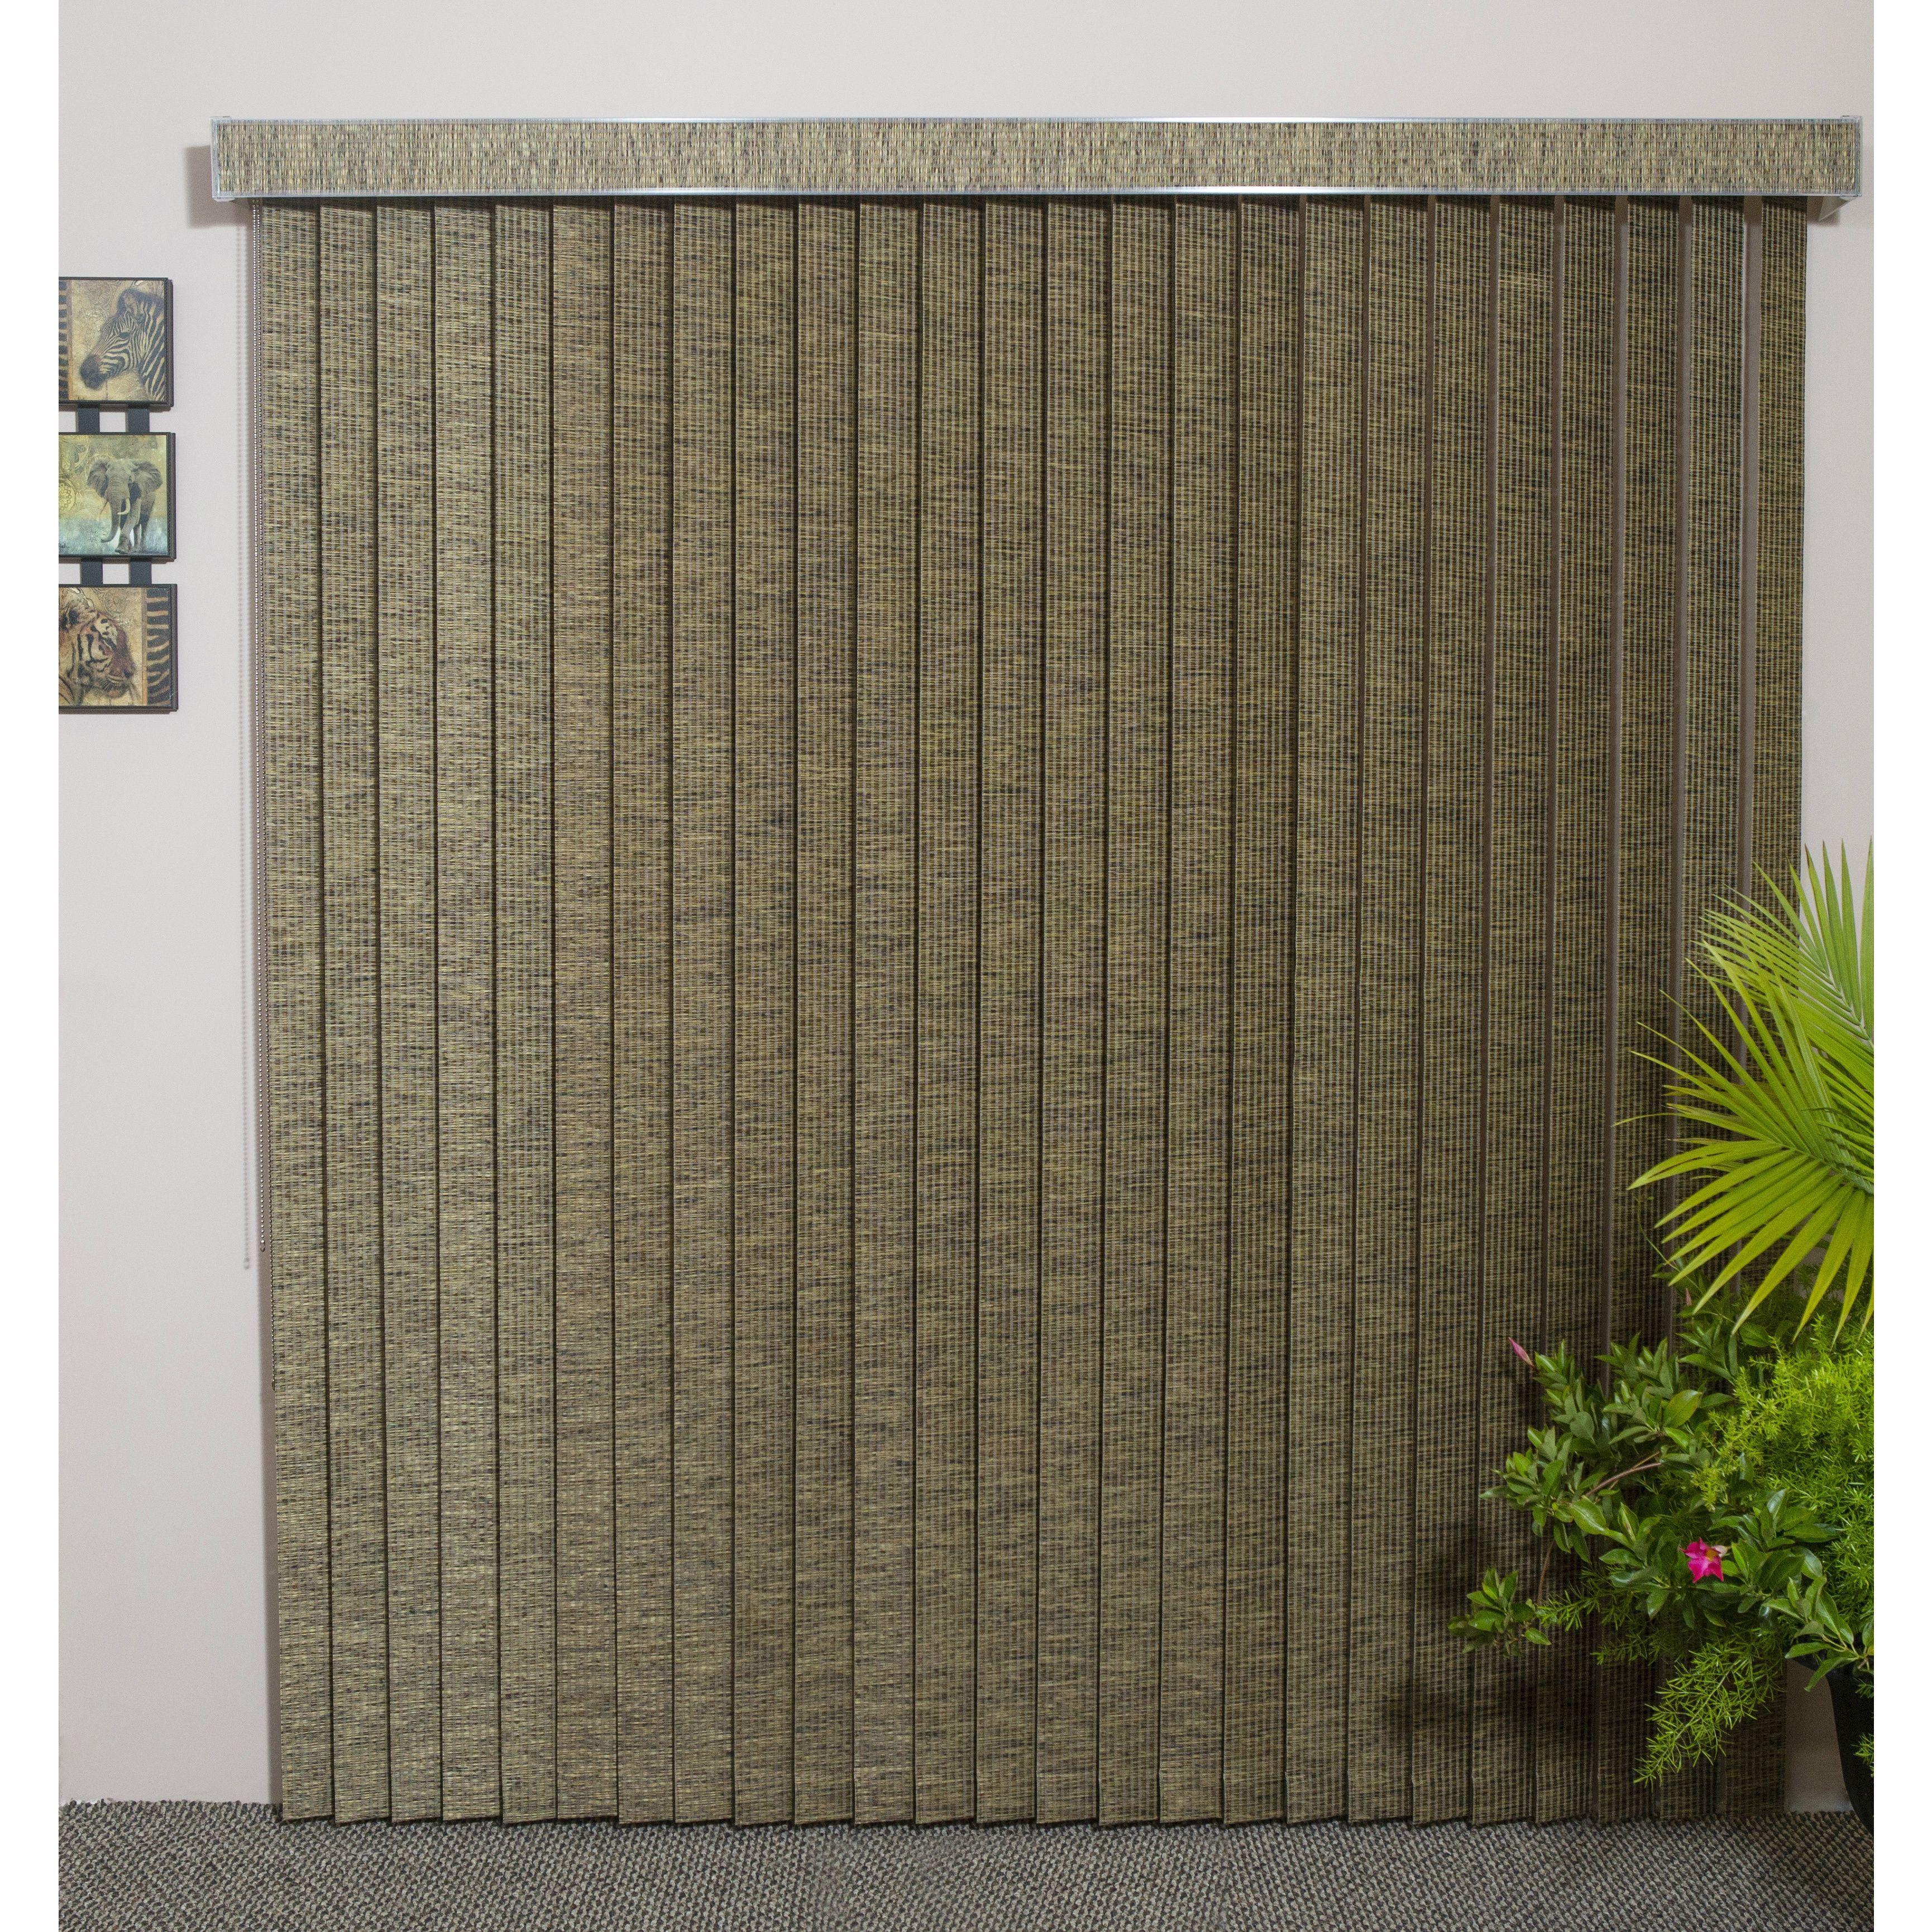 Znl Vertical Blinds  Edinborough 3 12 Free Hang Fabric (36